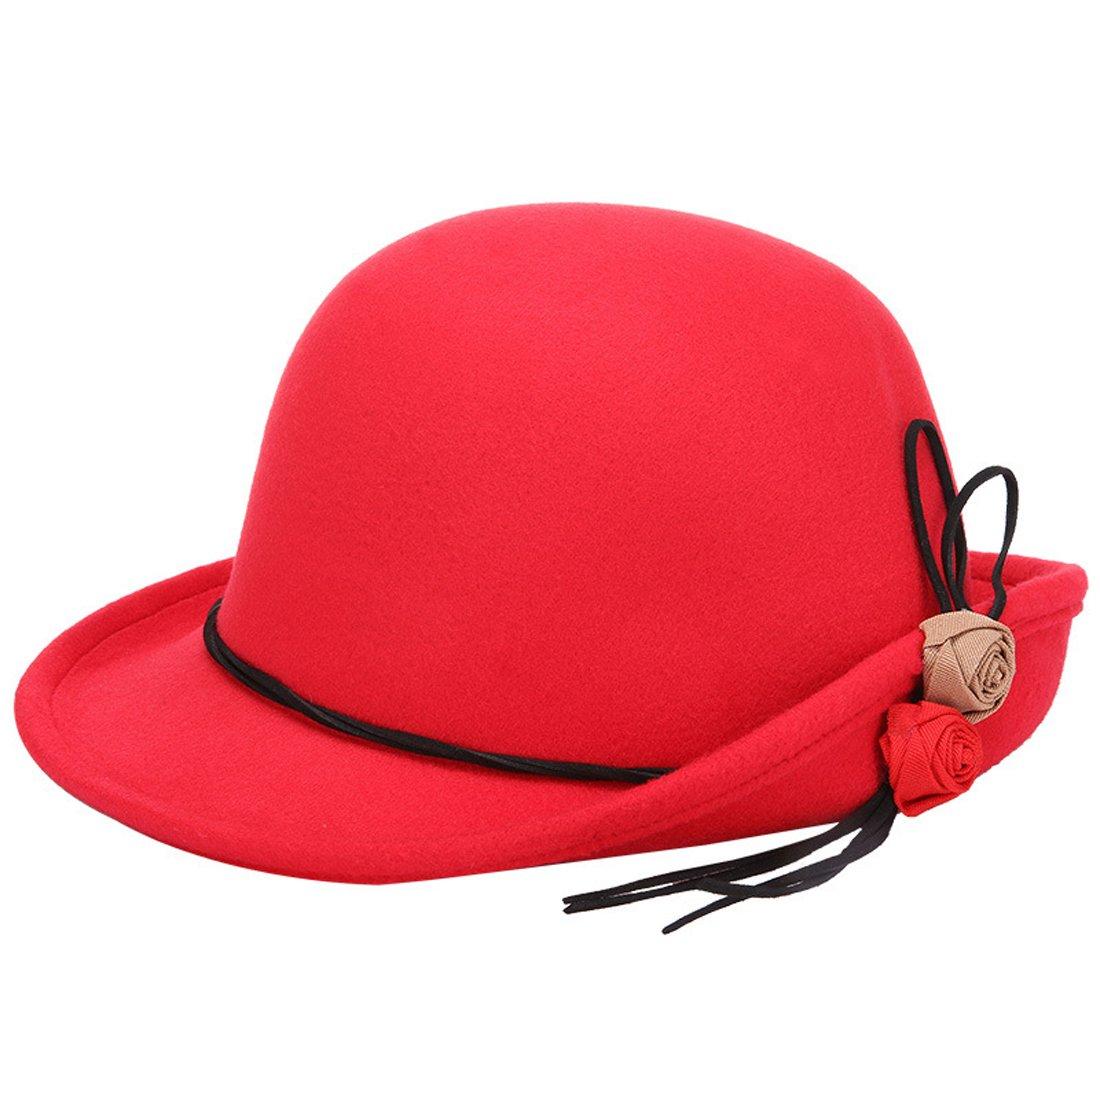 KAXIDY Women Ladies Vintage Wool Cloche Hats Bowler Bucket Caps Hat KS51129